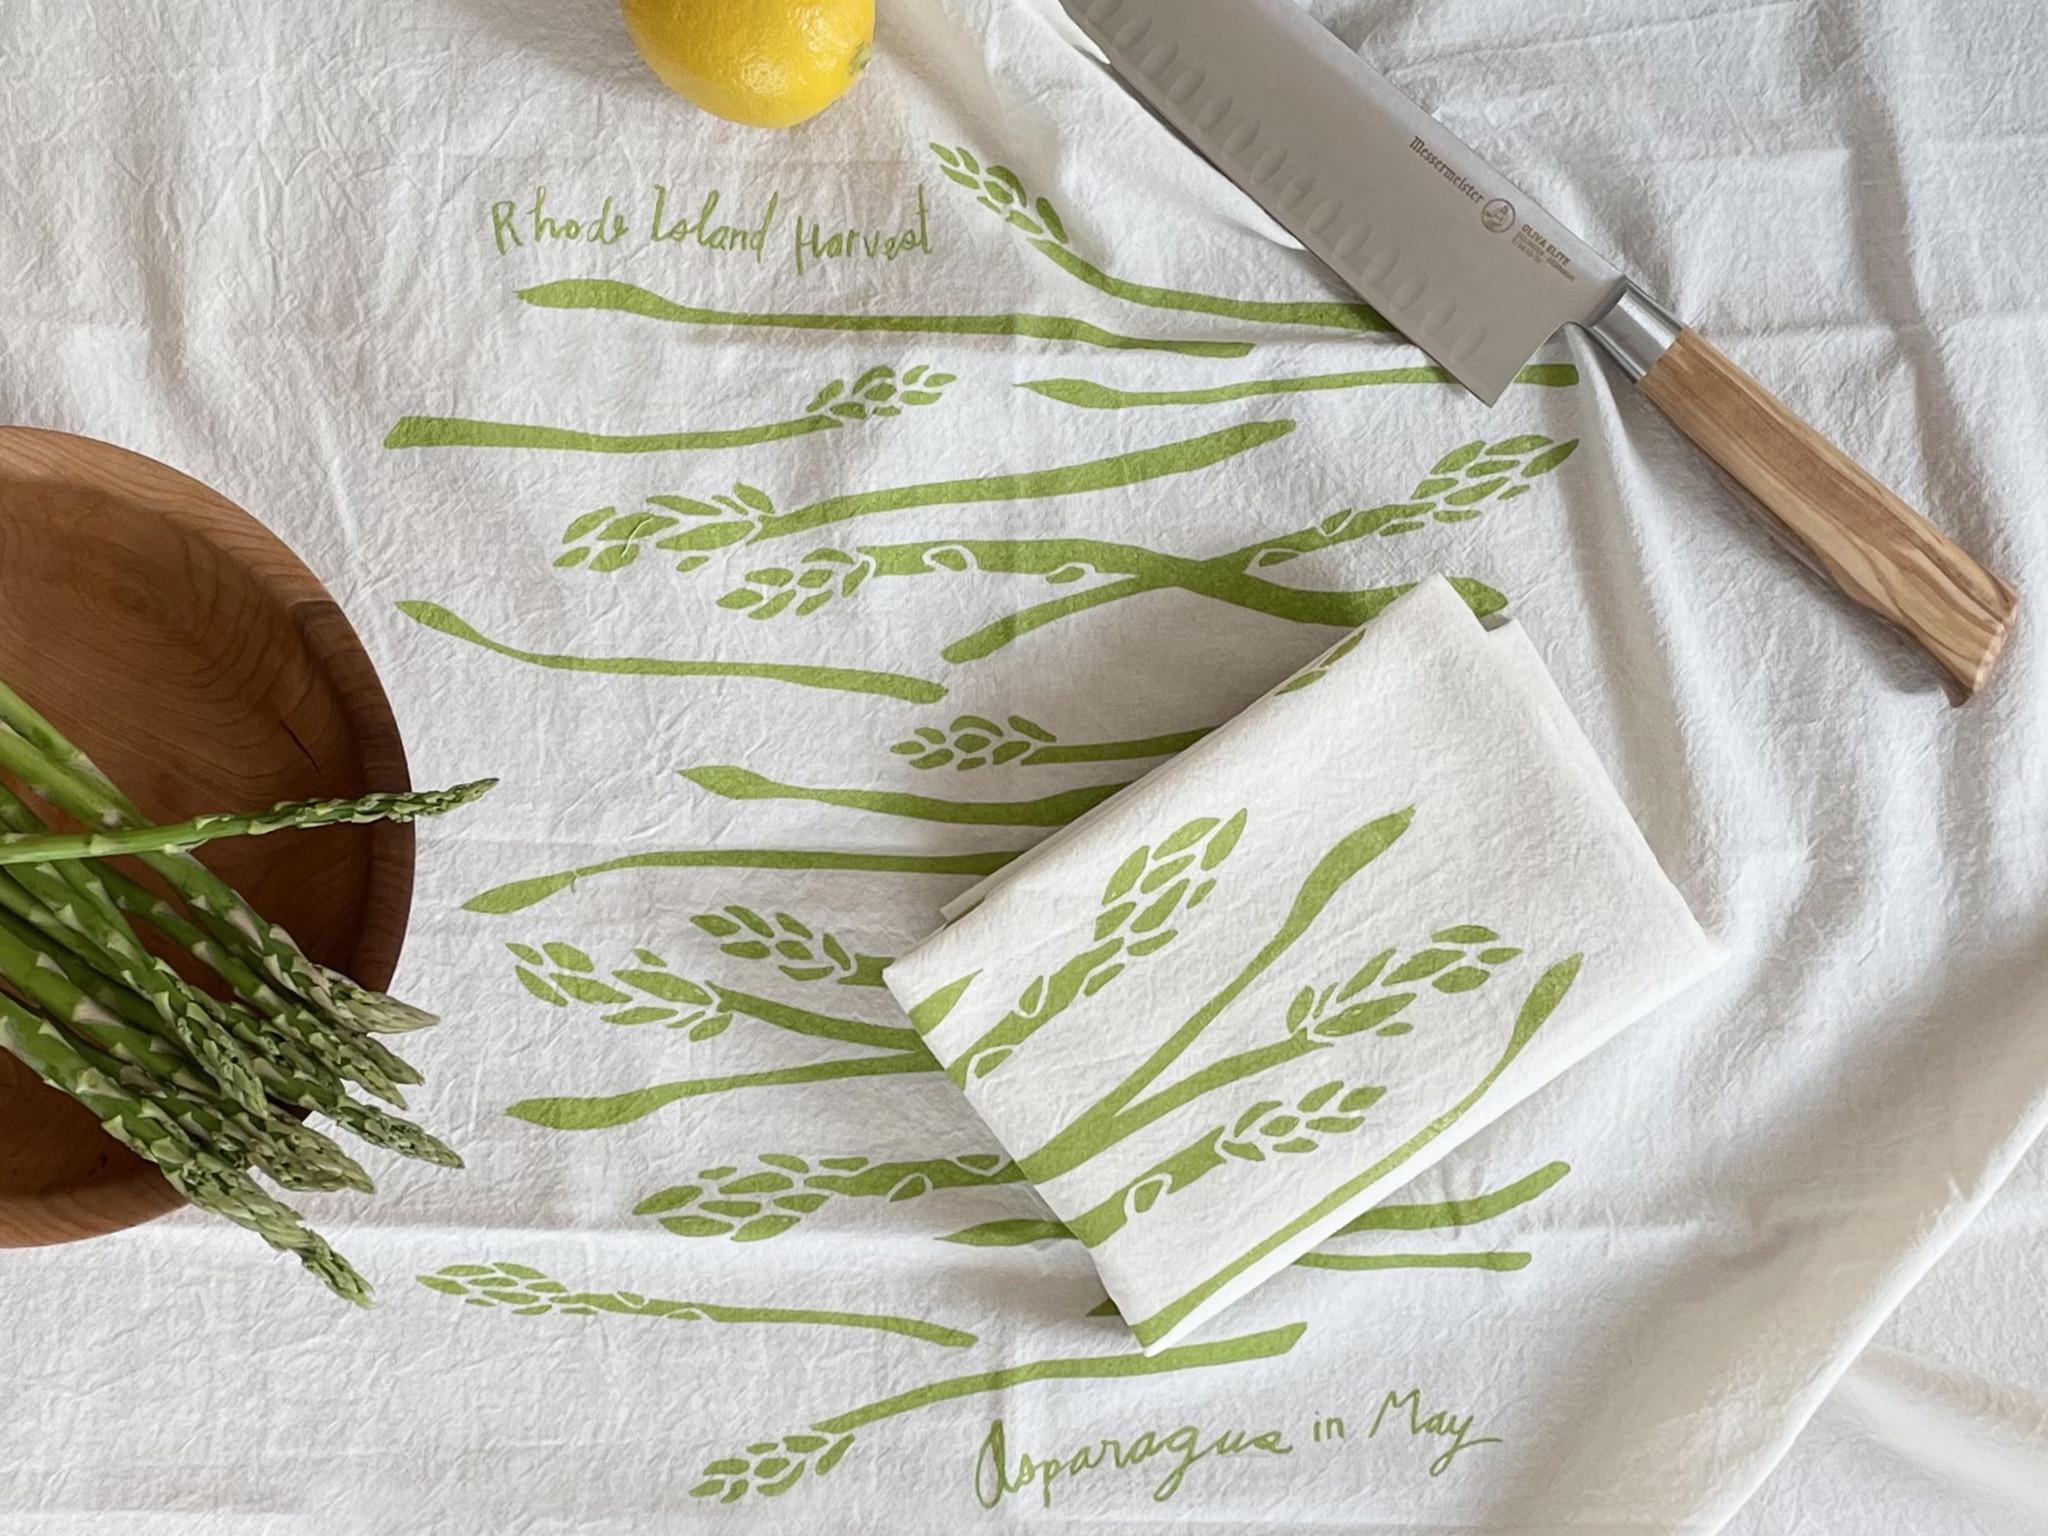 Rhode Island Harvest Tea Towels by Cricicis Design-6